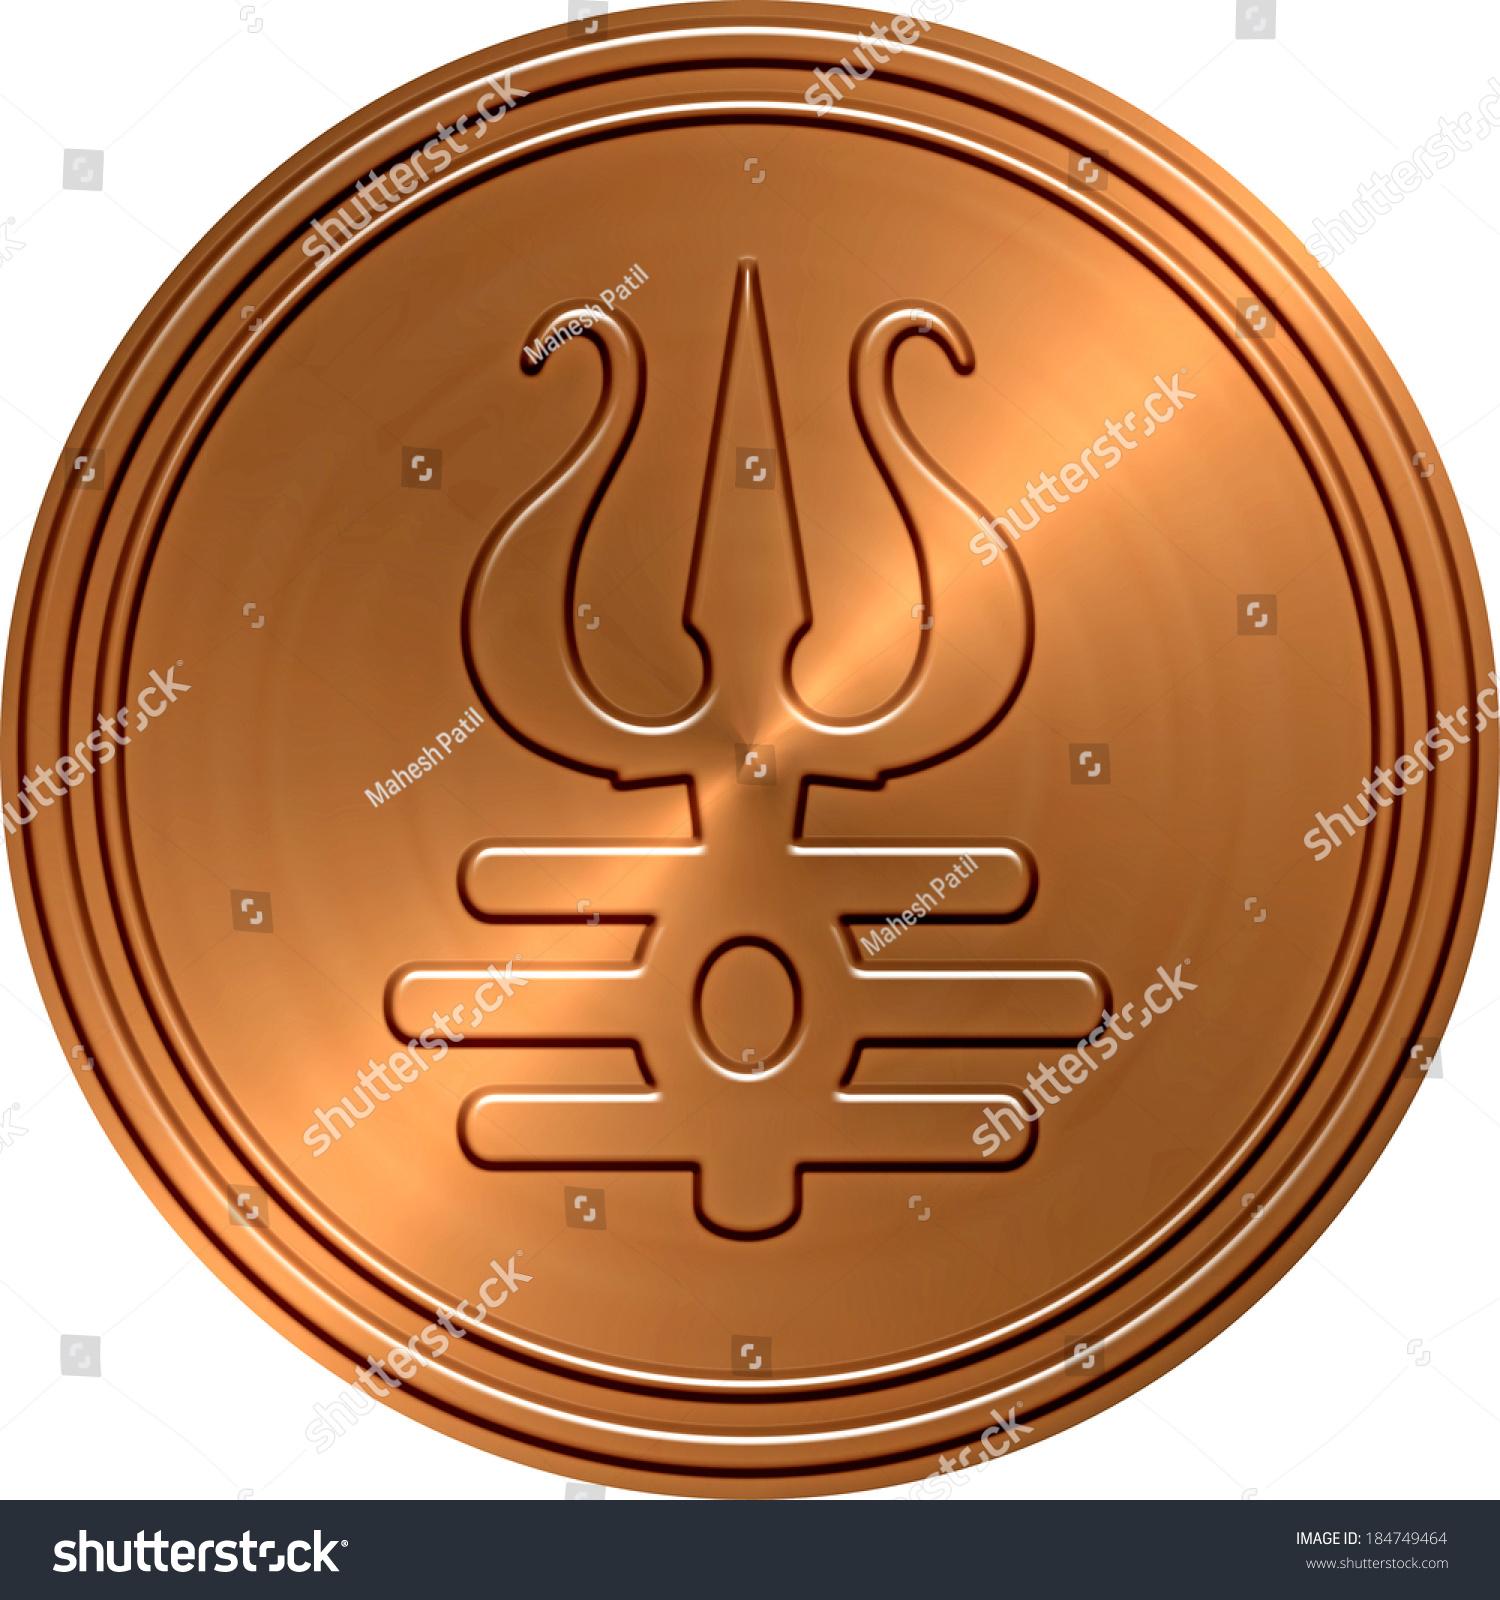 Hindu god shiva trishul sign copper stock photo 184749464 shutterstock hindu god shiva trishul sign copper coin buycottarizona Image collections